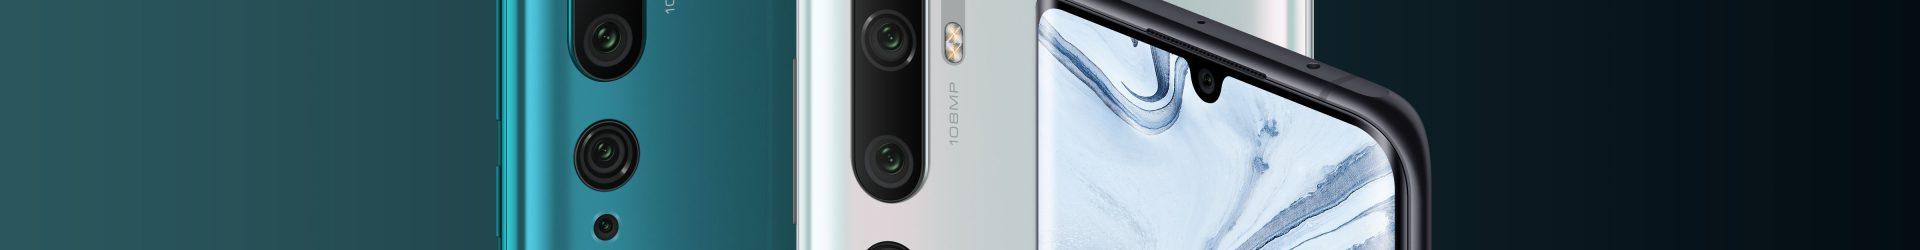 Xiaomi Mi Note 10 ufficiale: oltre la fotocamera da 108 MP c'è di più